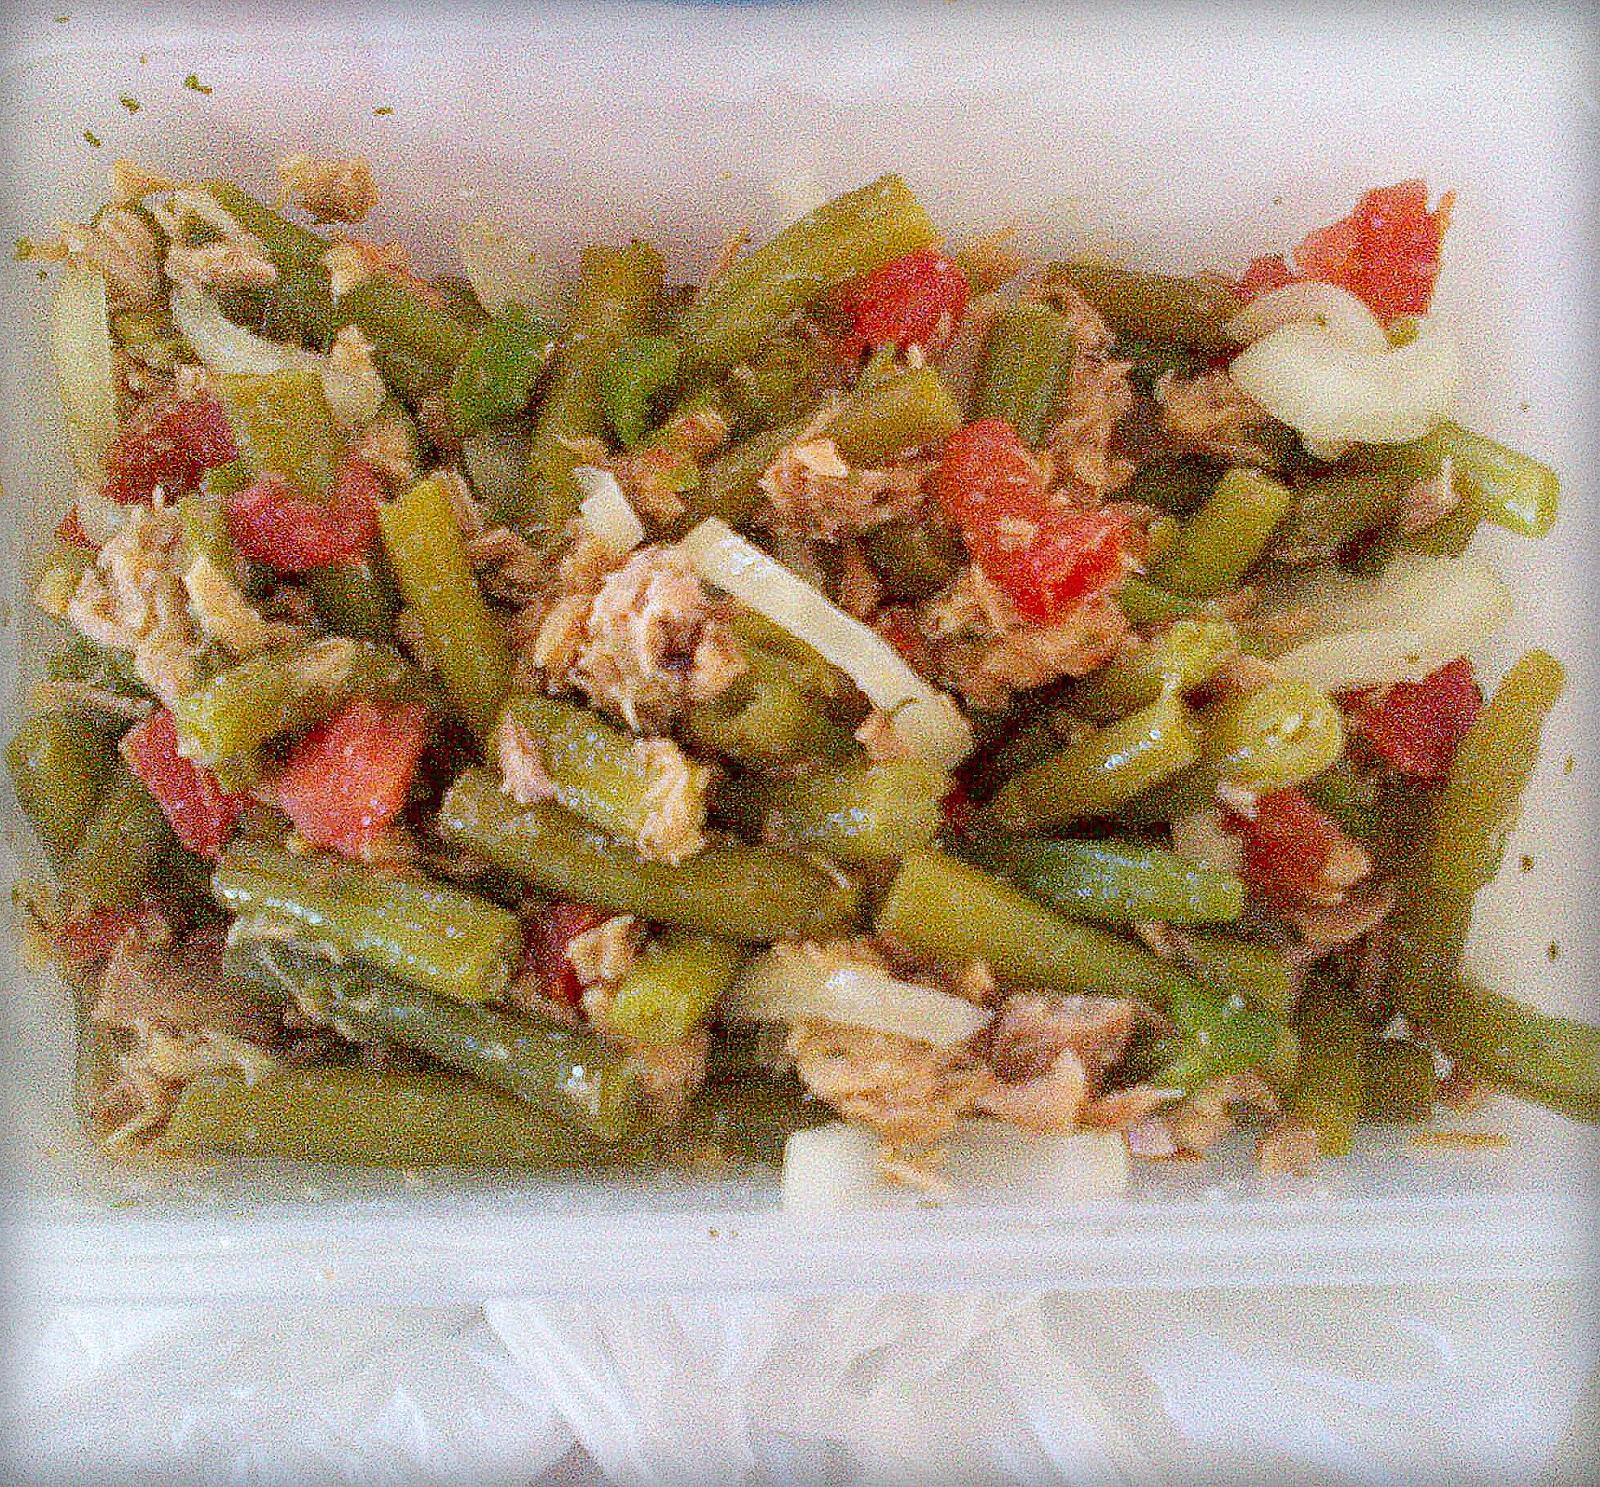 Tu cocina light ensalada de judias verdes con atun - Ensalada de judias verdes arguinano ...